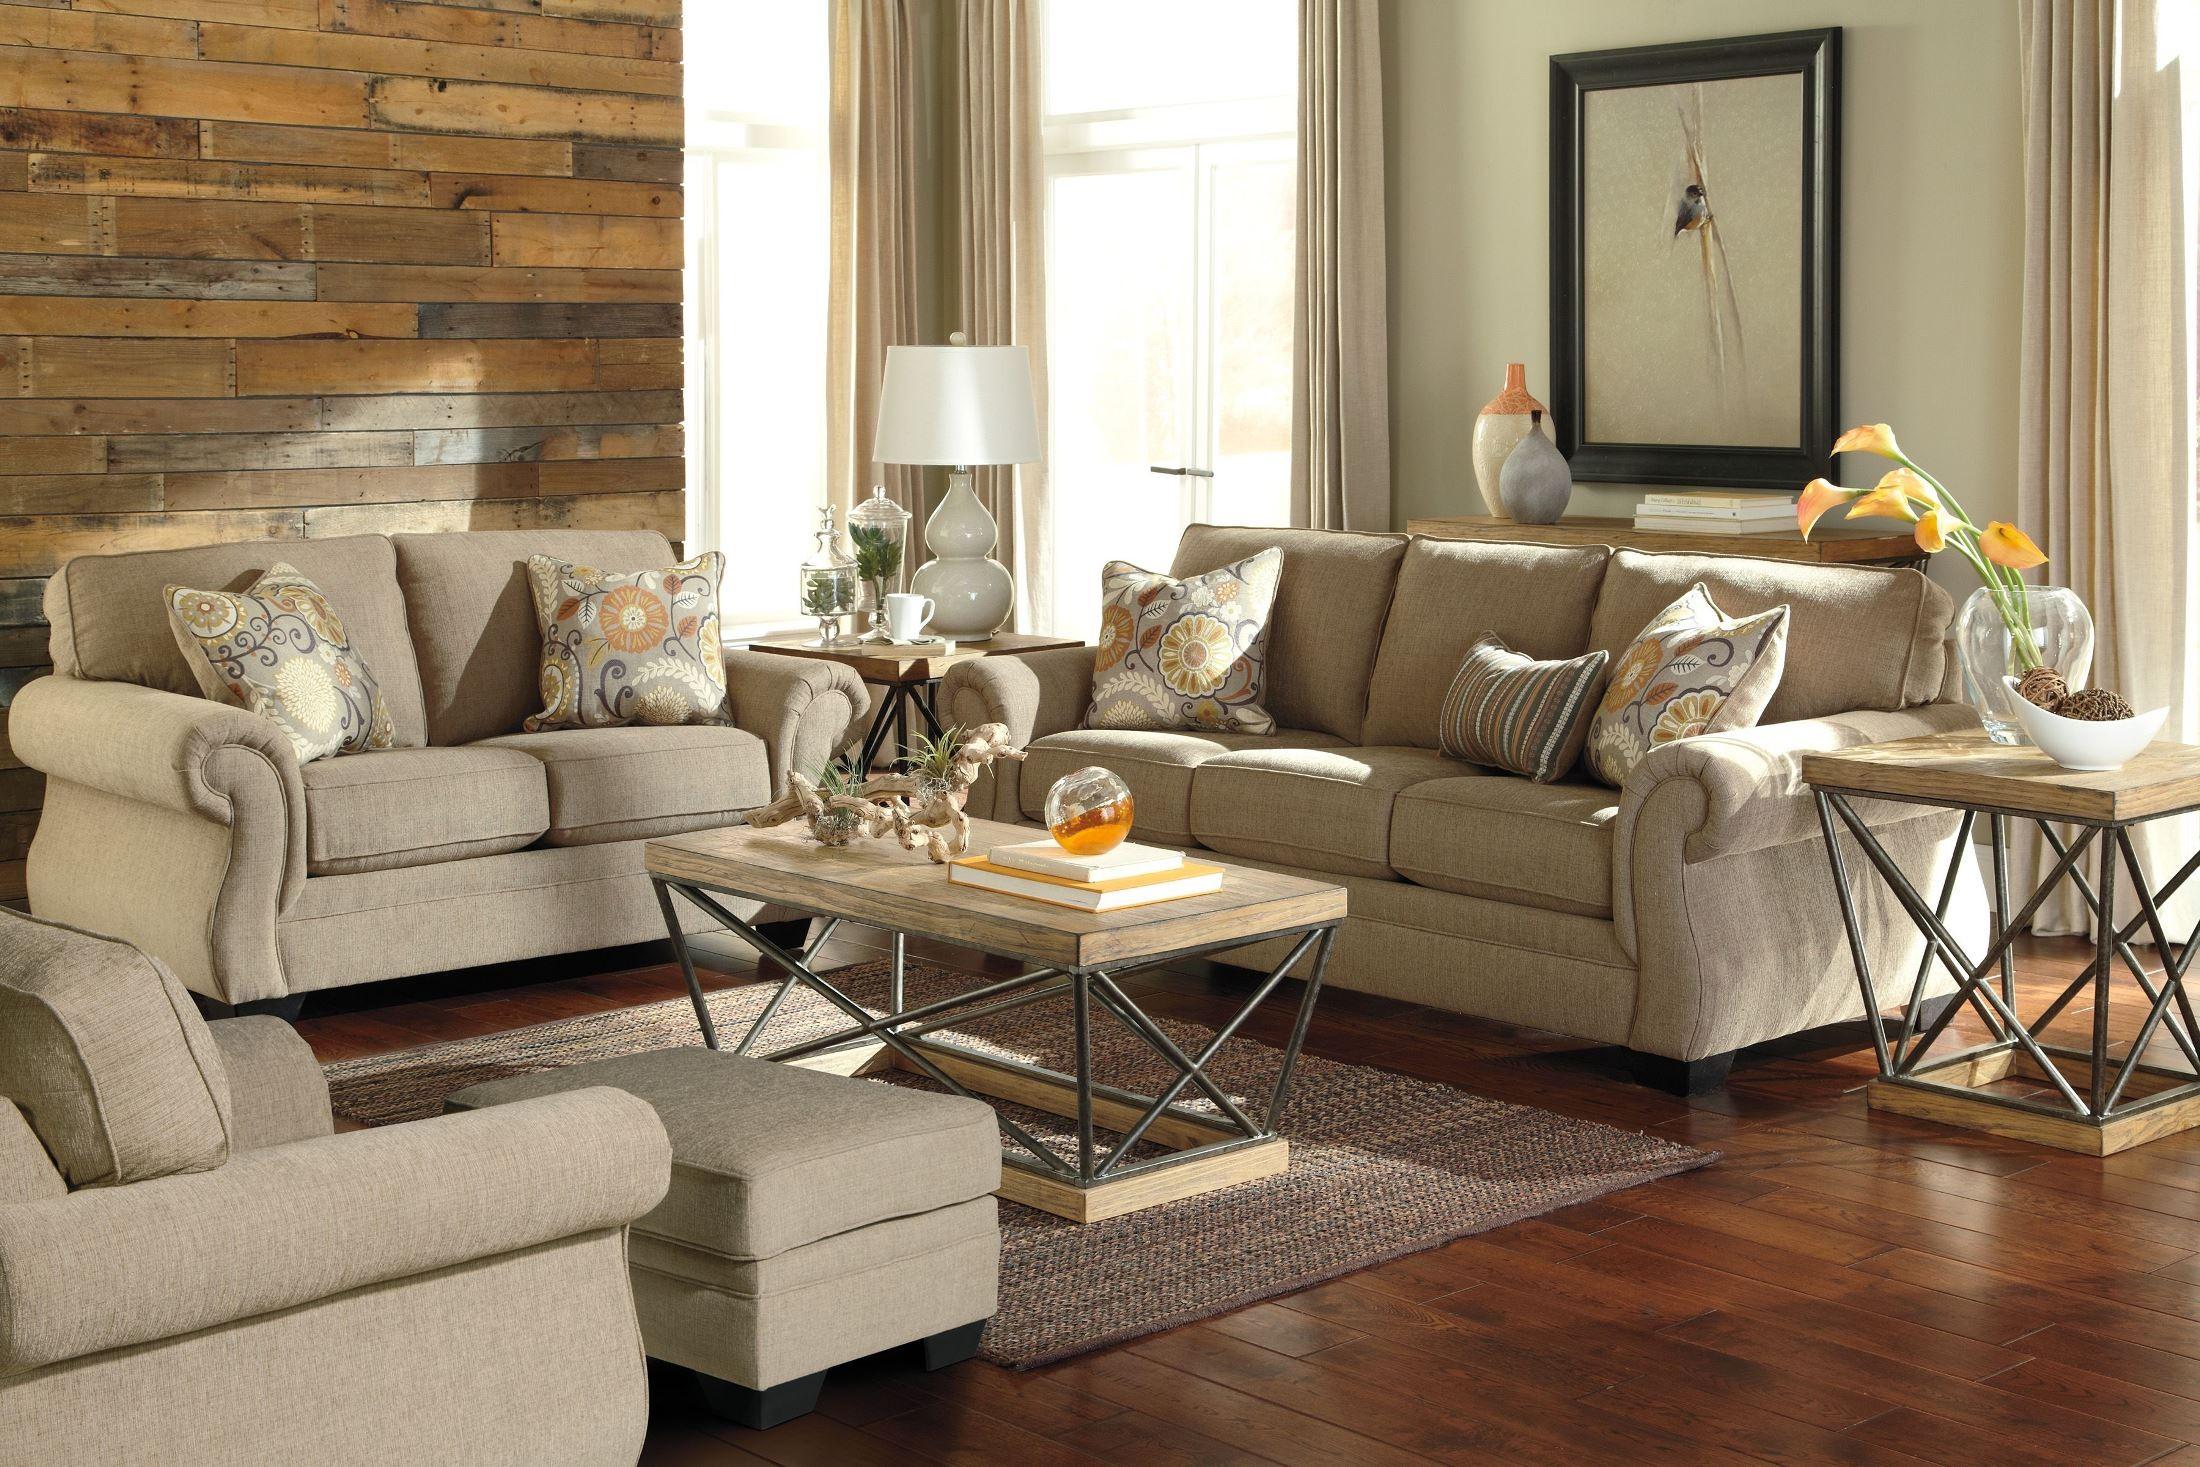 Tailya Barley Living Room Set From Ashley 4770038